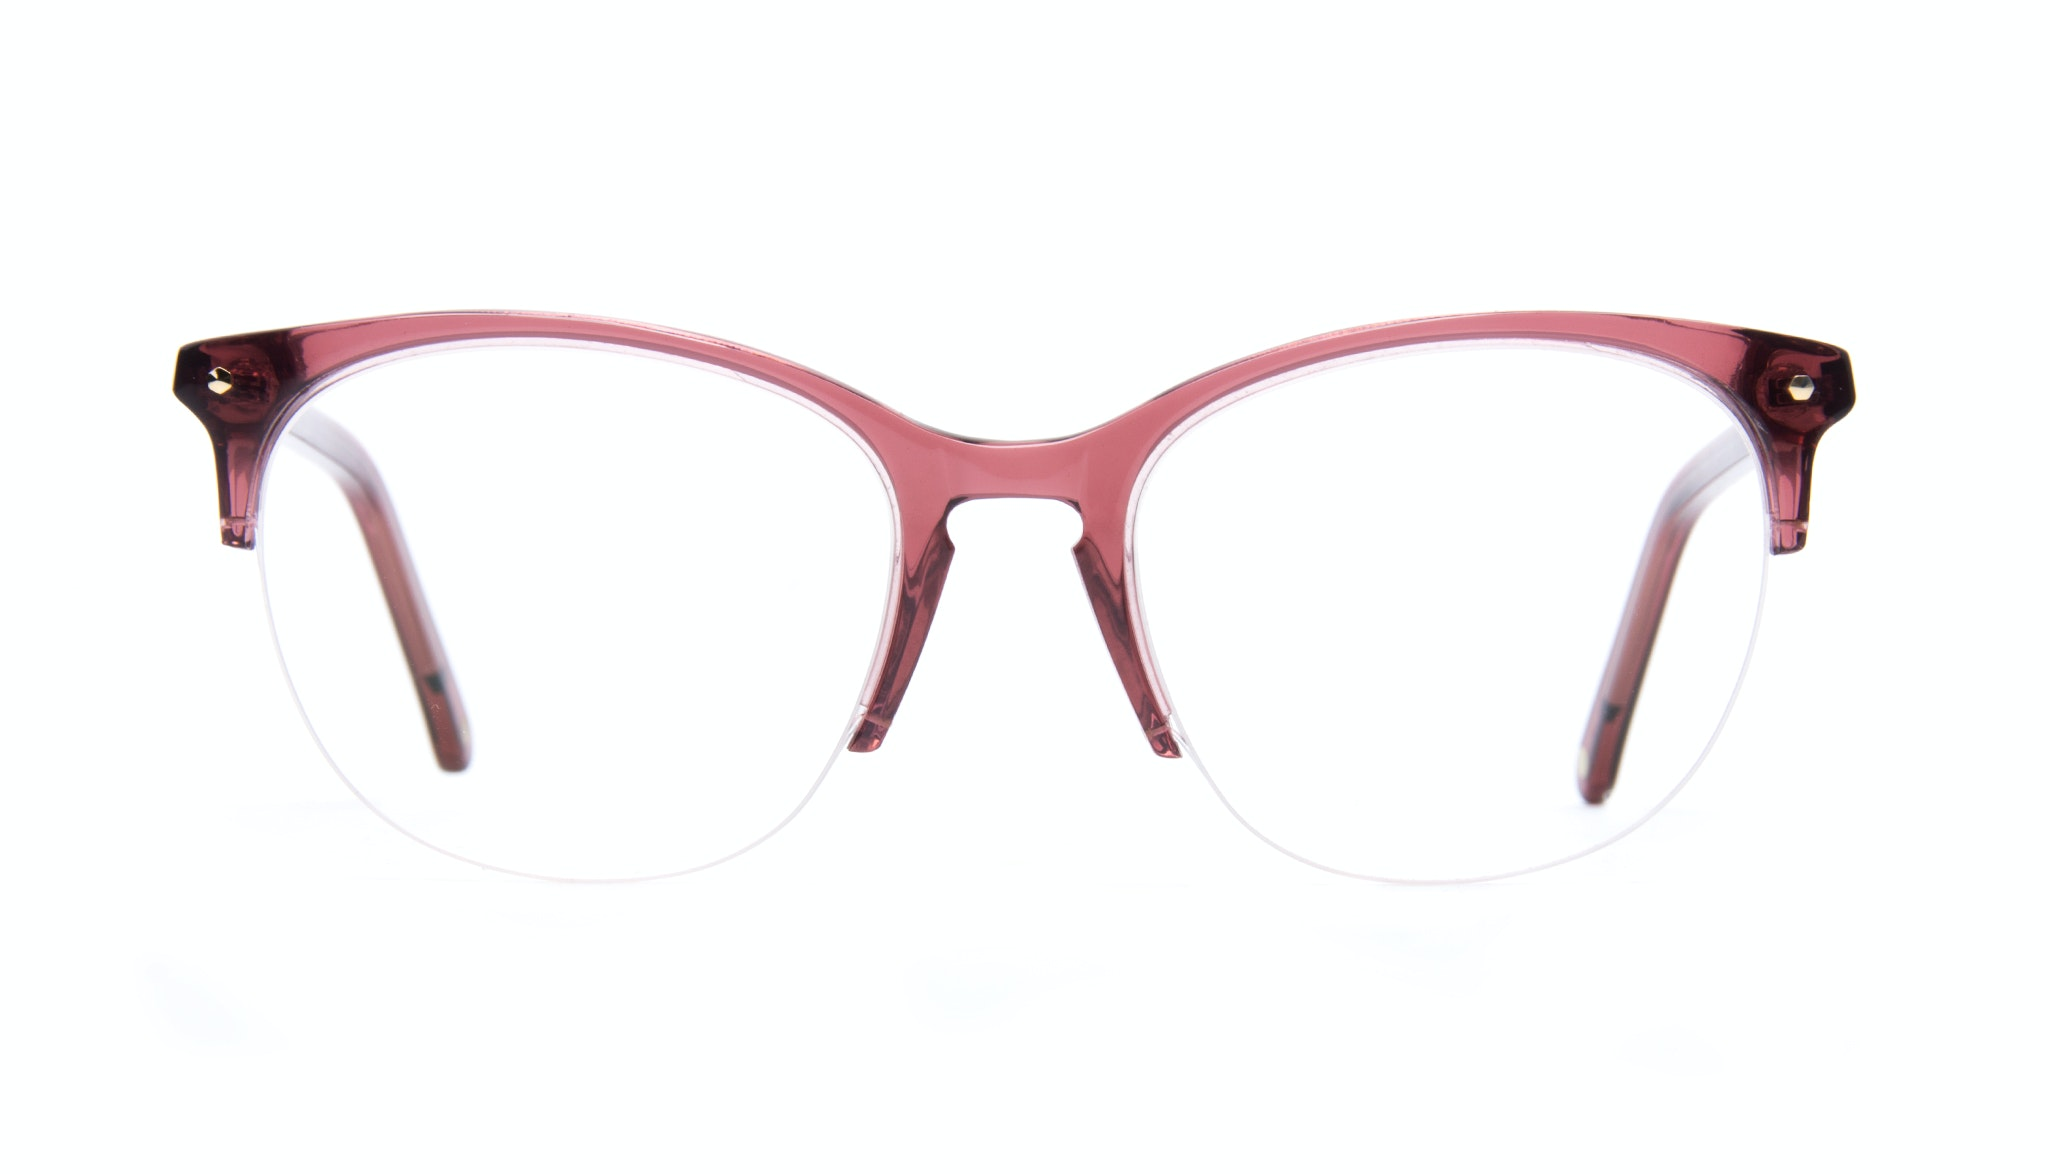 Affordable Fashion Glasses Rectangle Square Round Semi-Rimless Eyeglasses Women Nadine Light Winegum Front